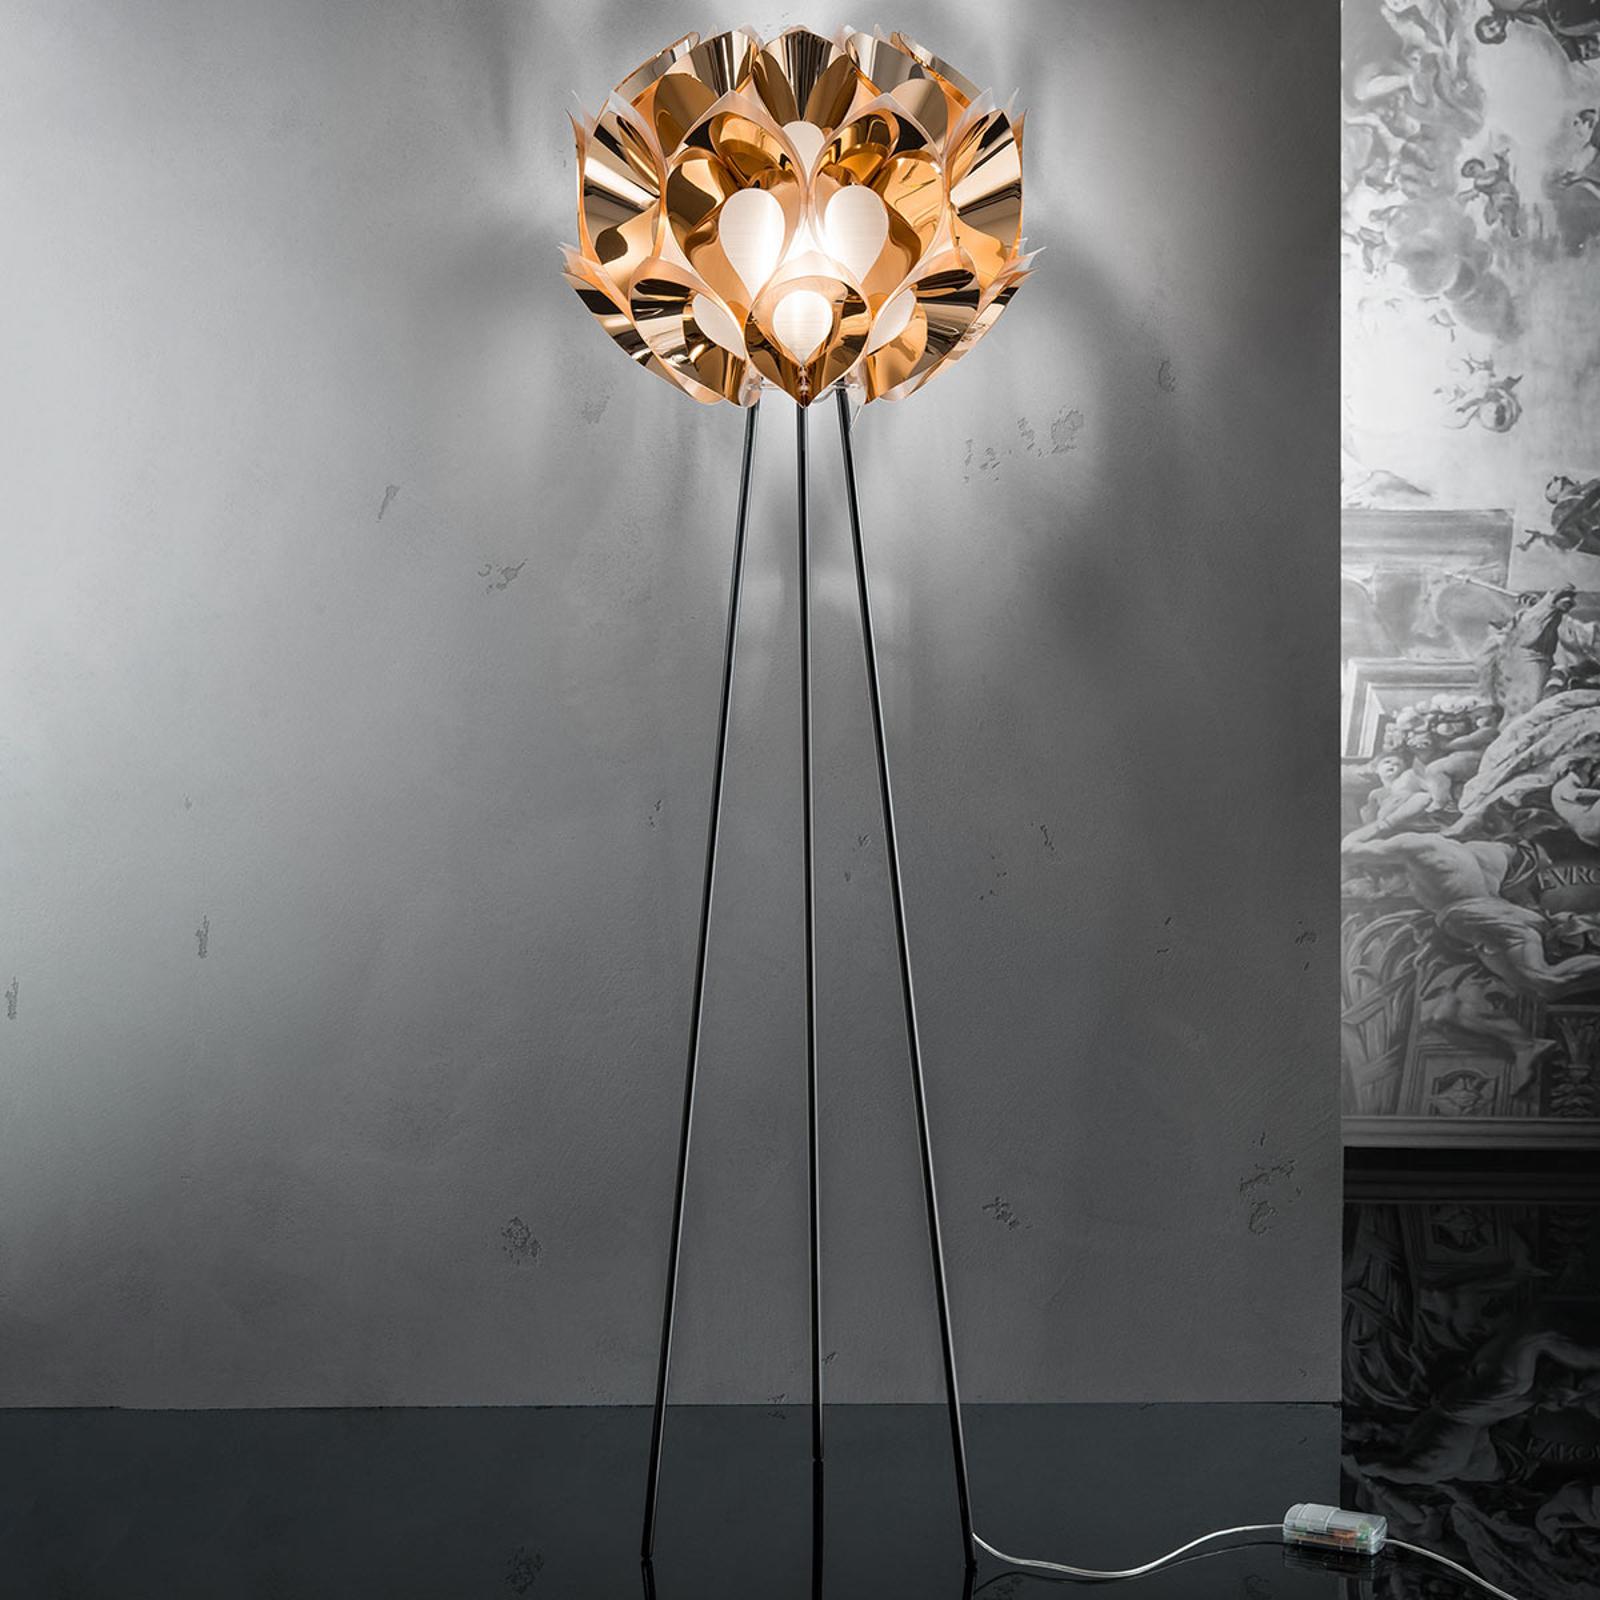 FLORA - designerska lampa stojąca, miedziana